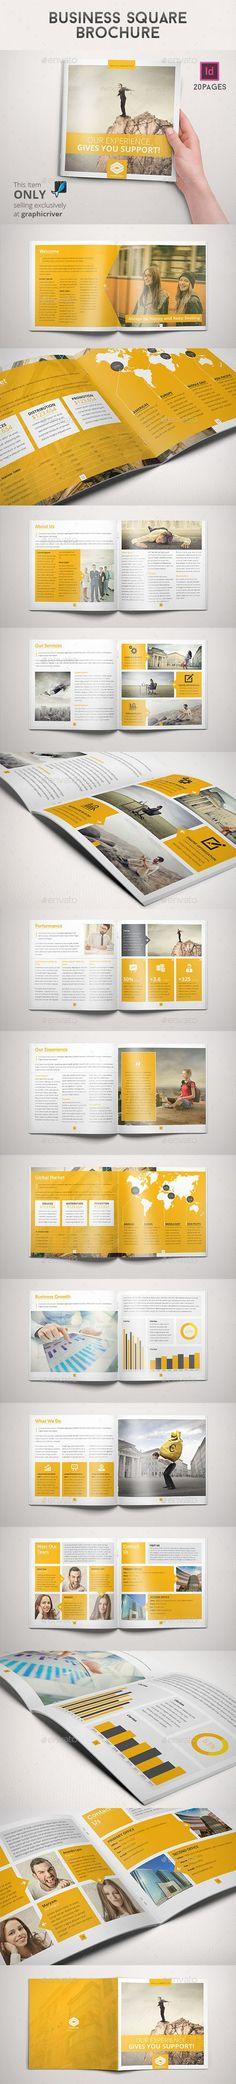 Business Square Brochure